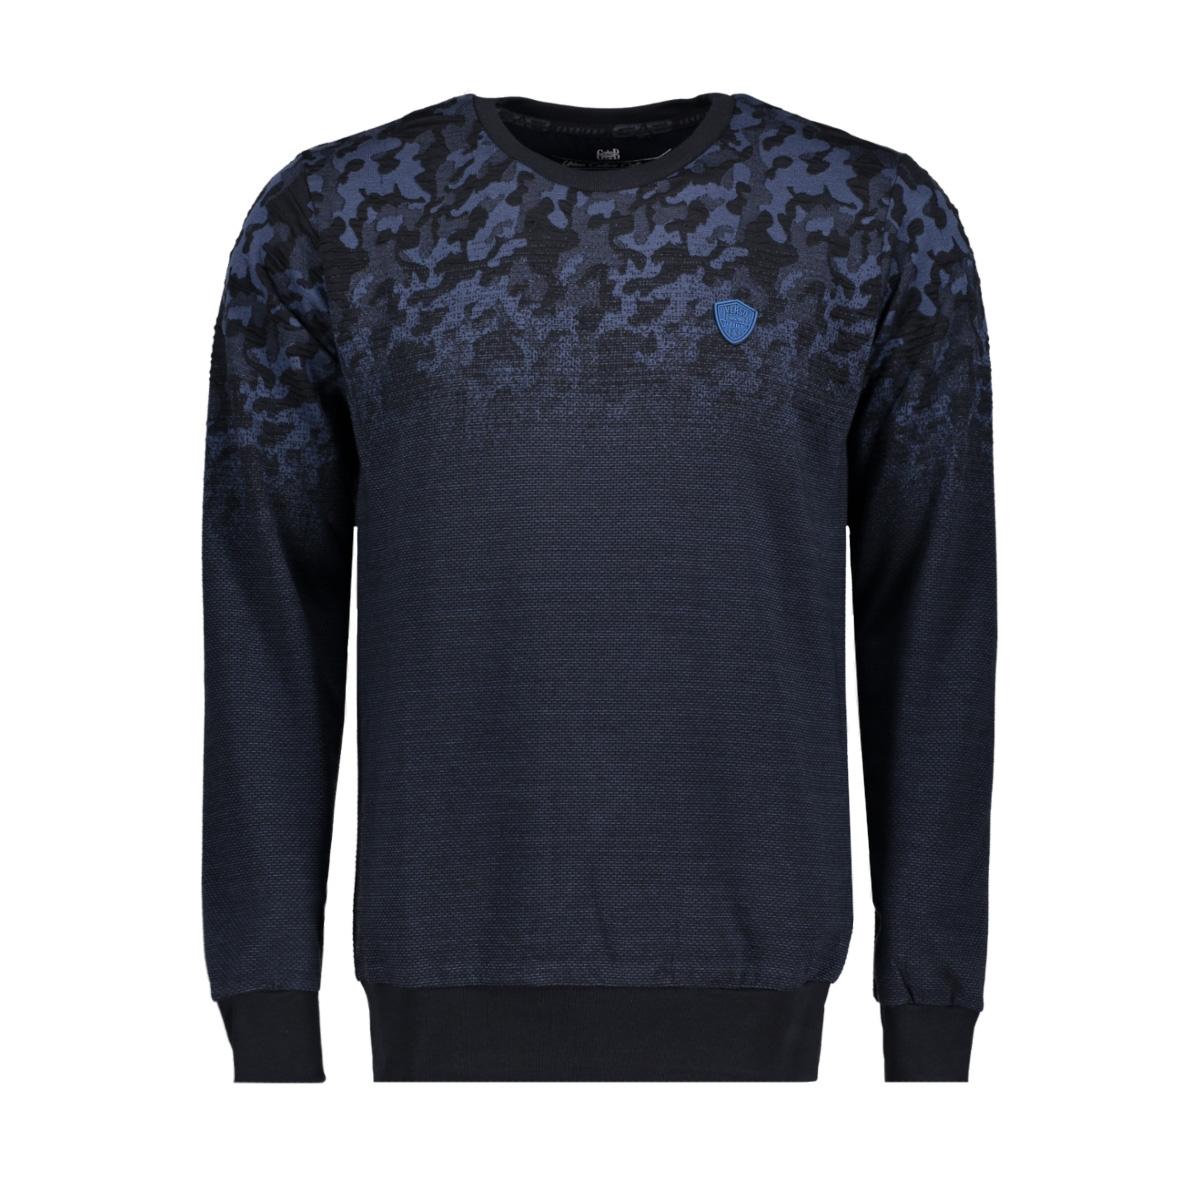 76122 gabbiano sweater navy